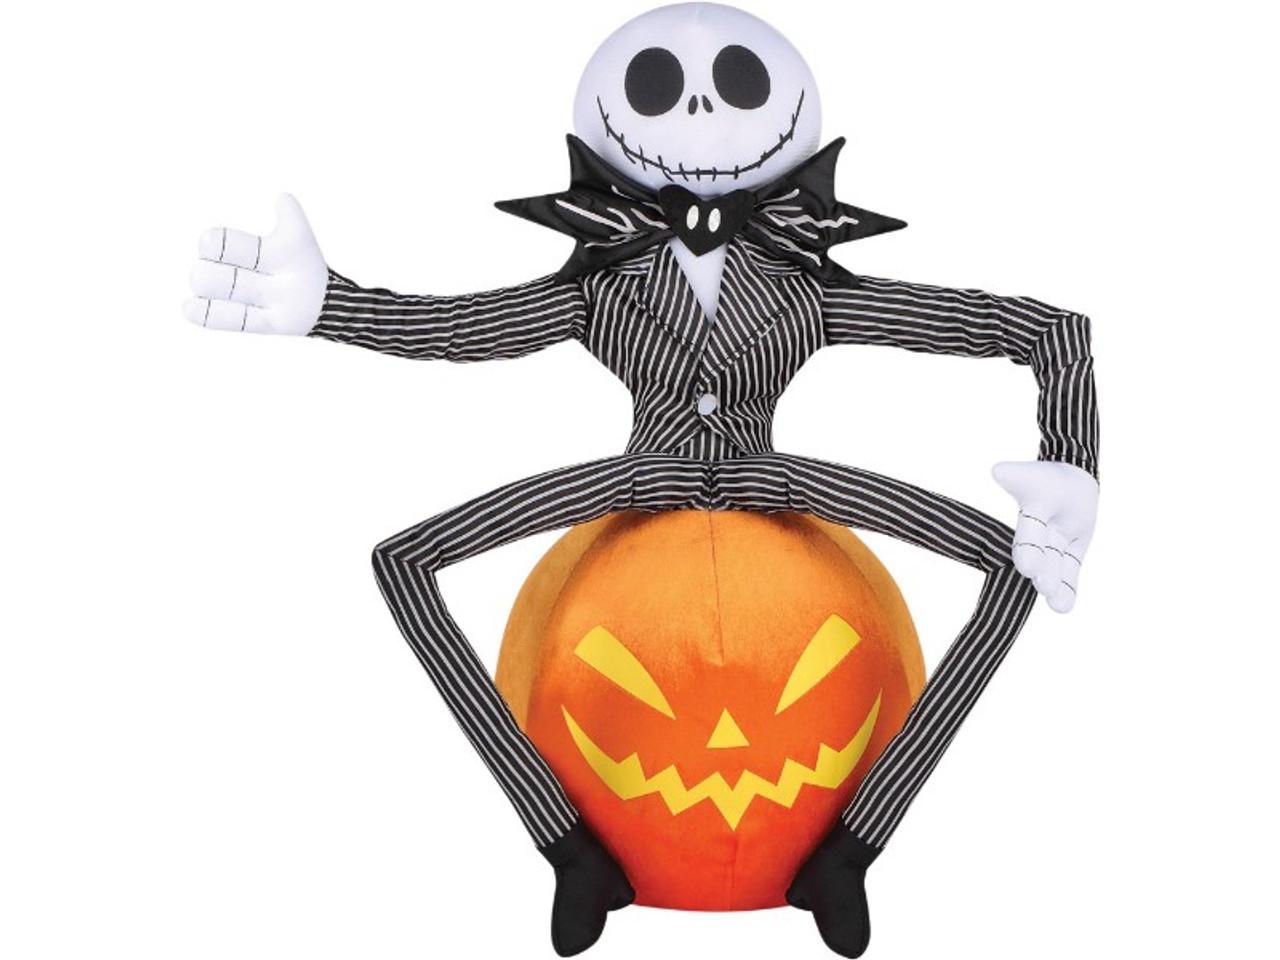 Halloween Jack Skellington Scary.Jack Skellington Plush Door Greeter